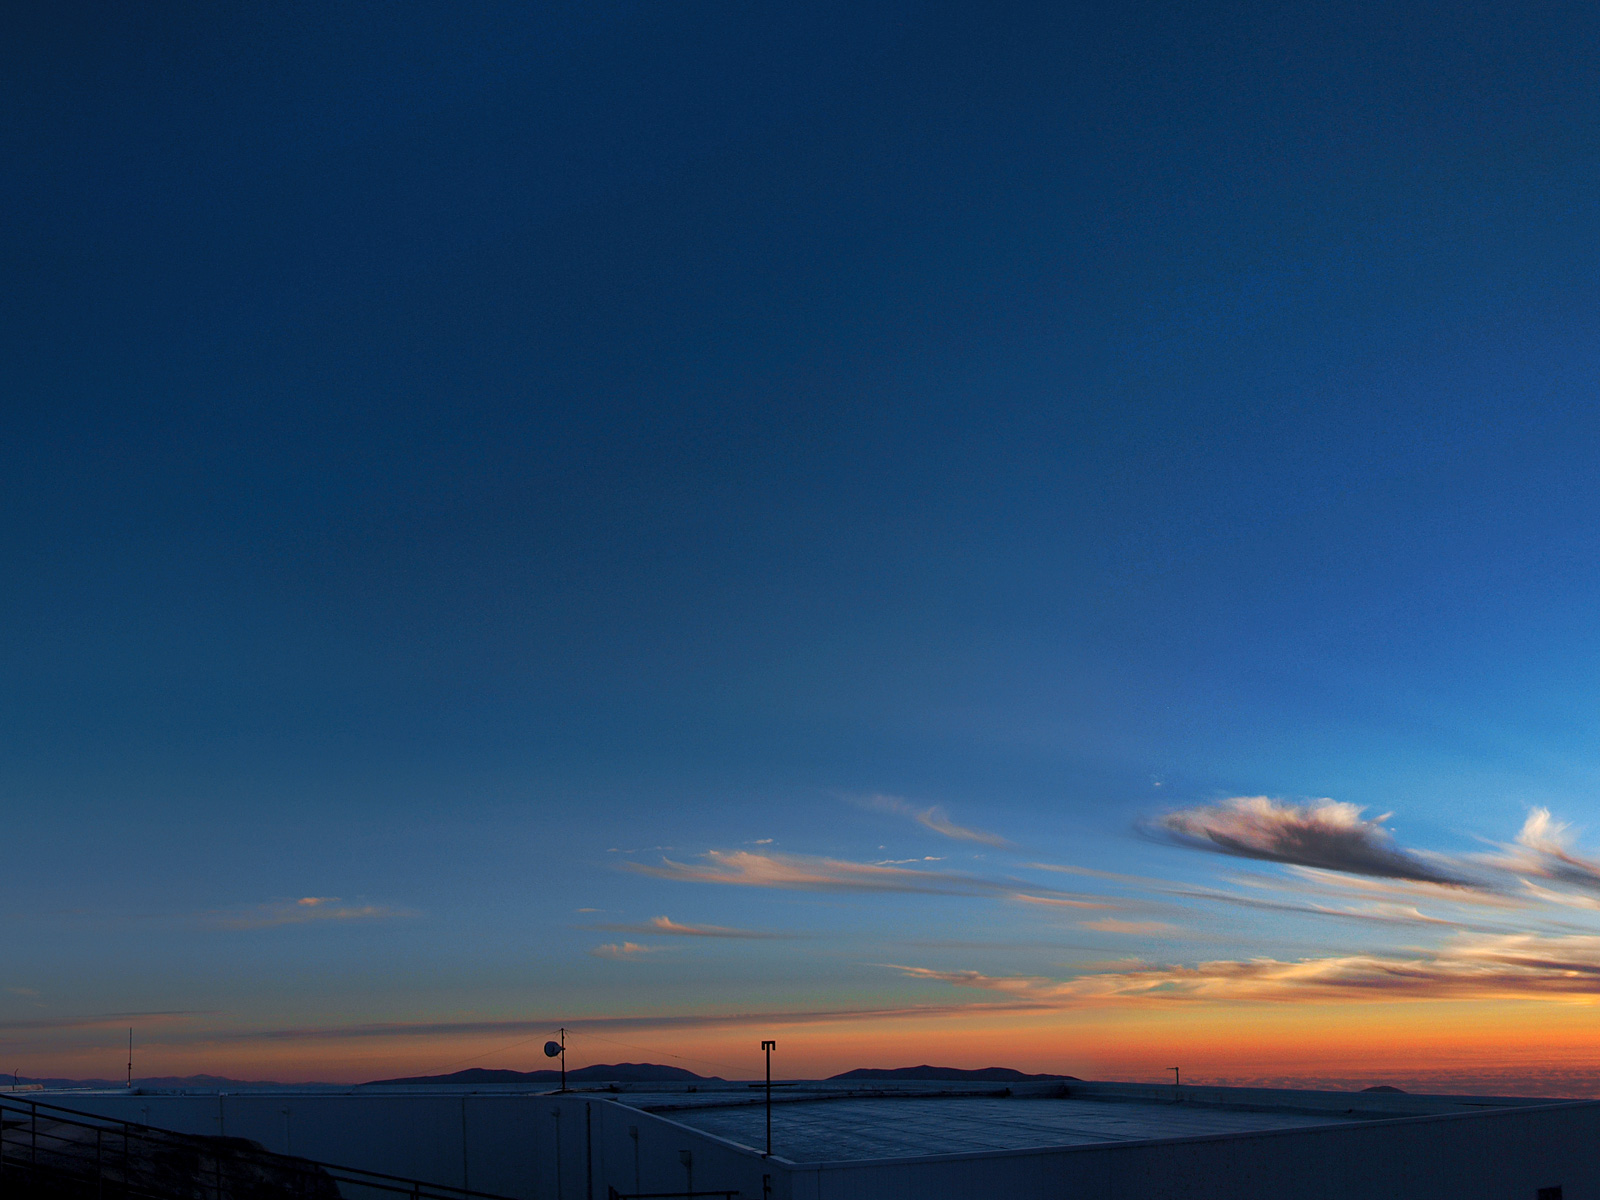 Paranal Observatory Sunset